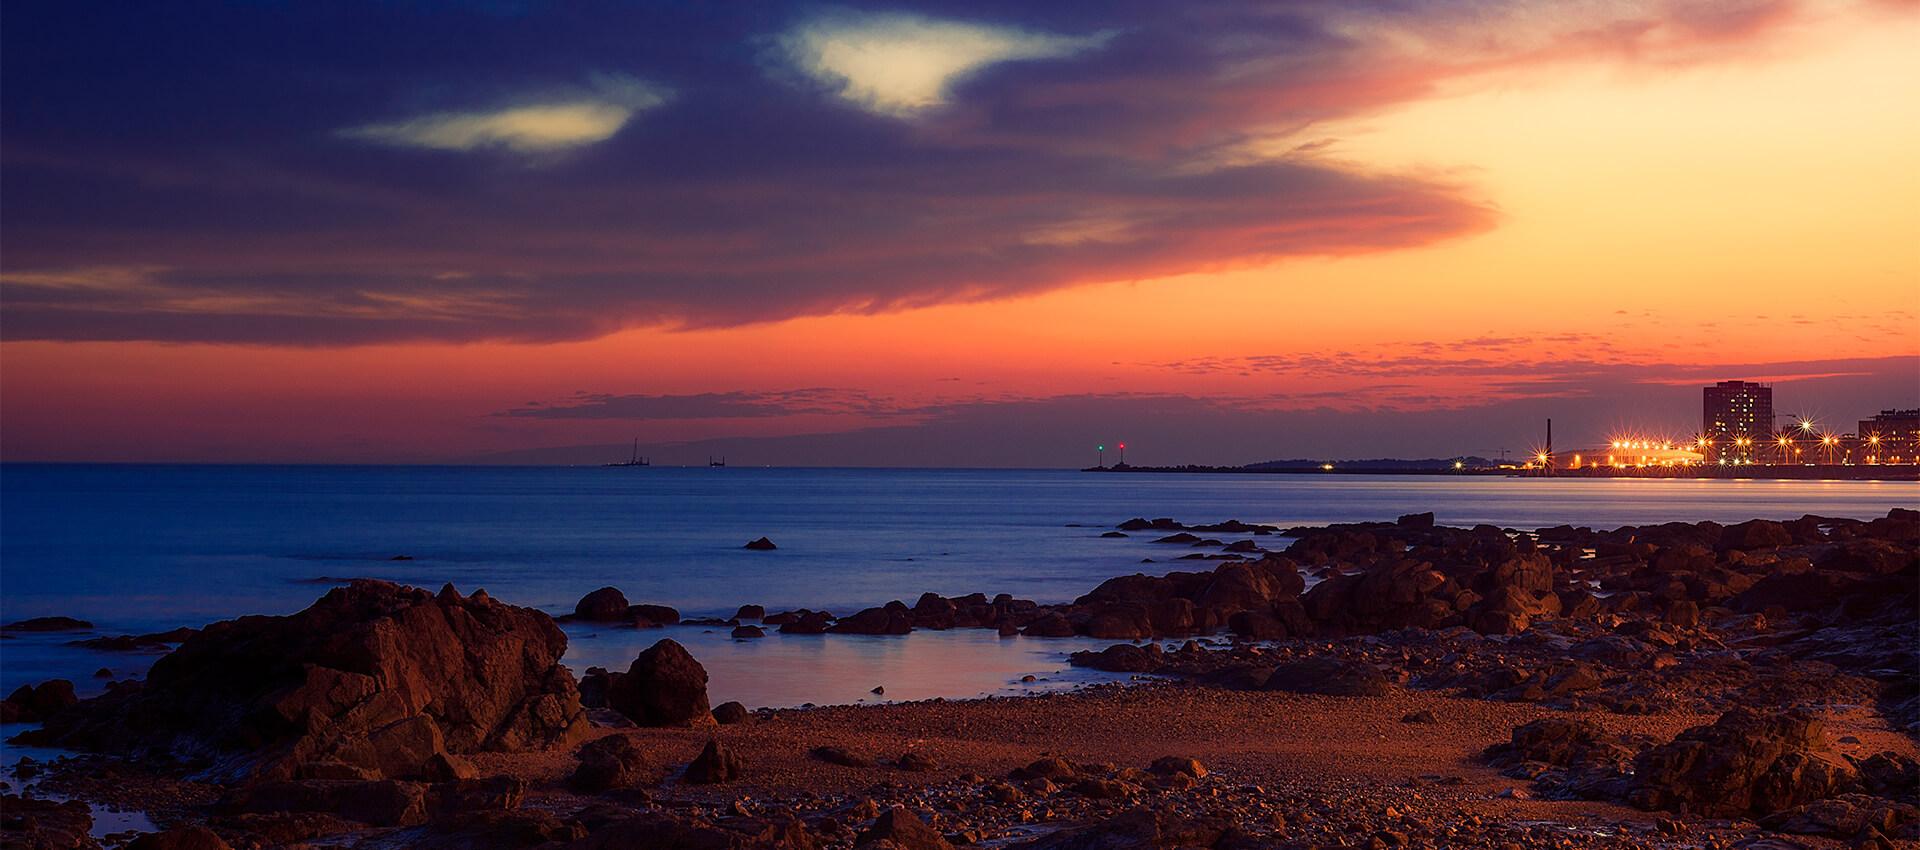 Western Uruguay